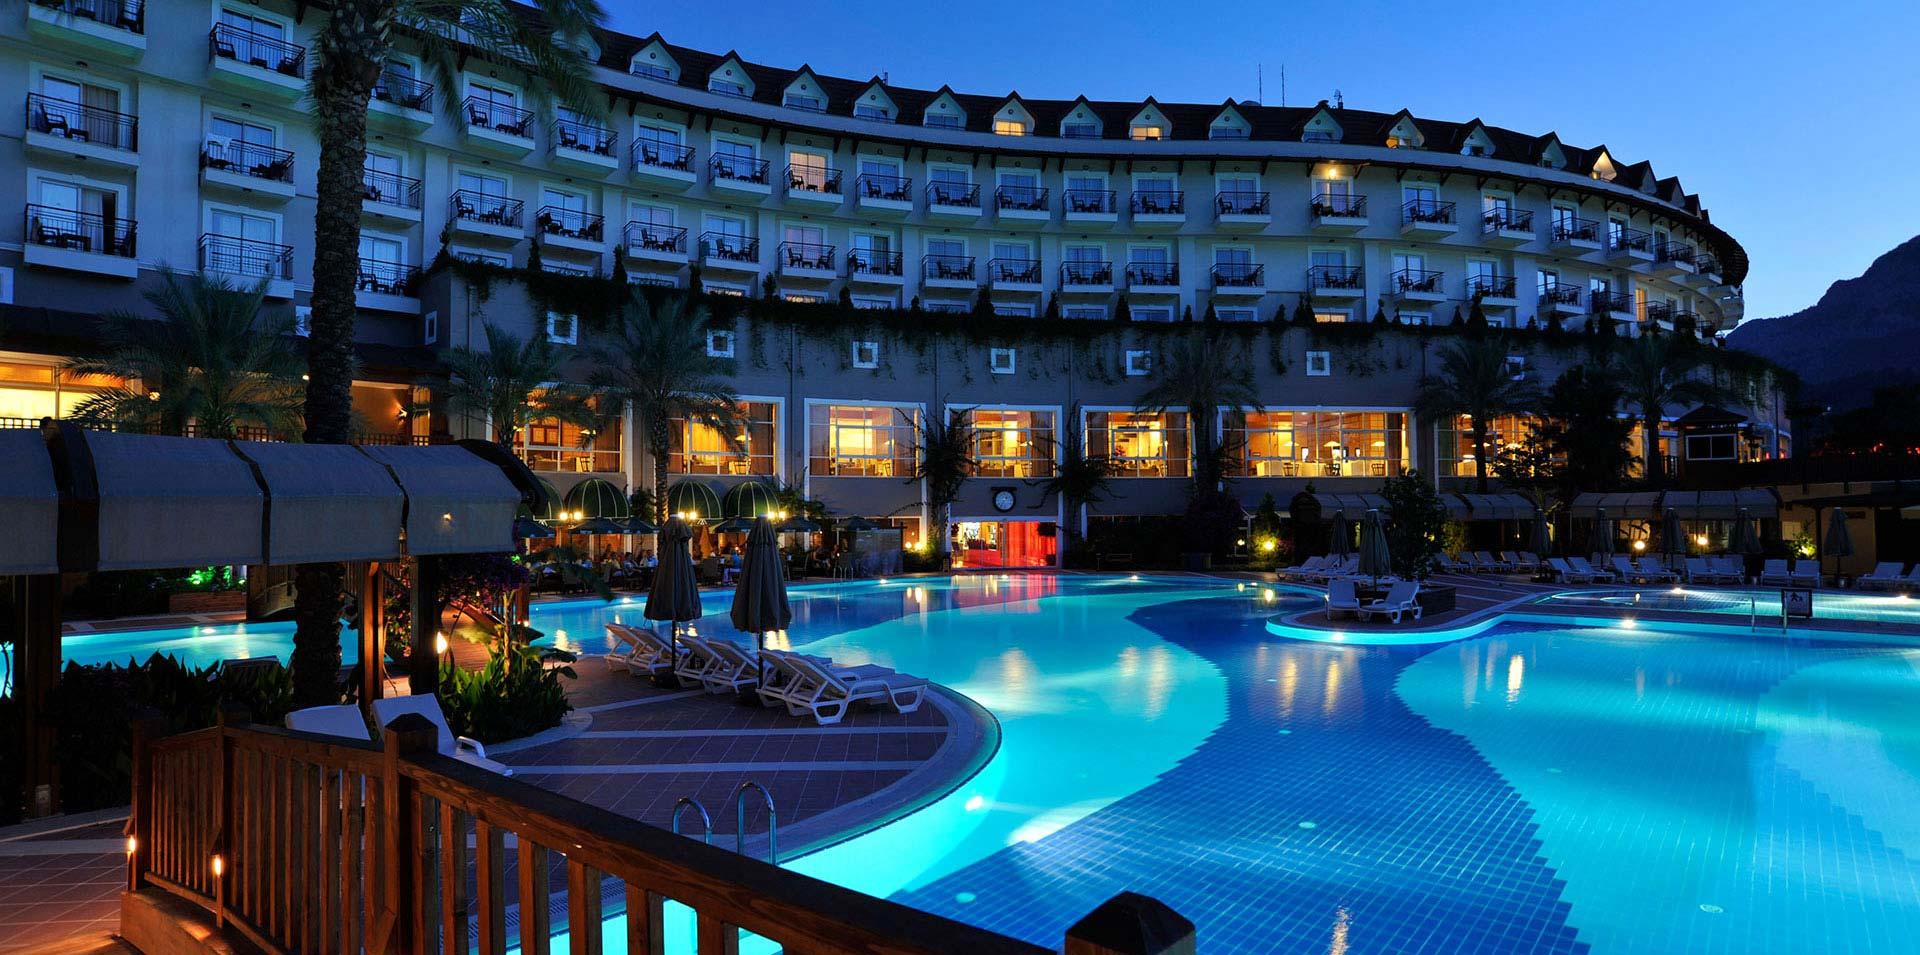 هتل کلاب پرستیژ کوش آداسی